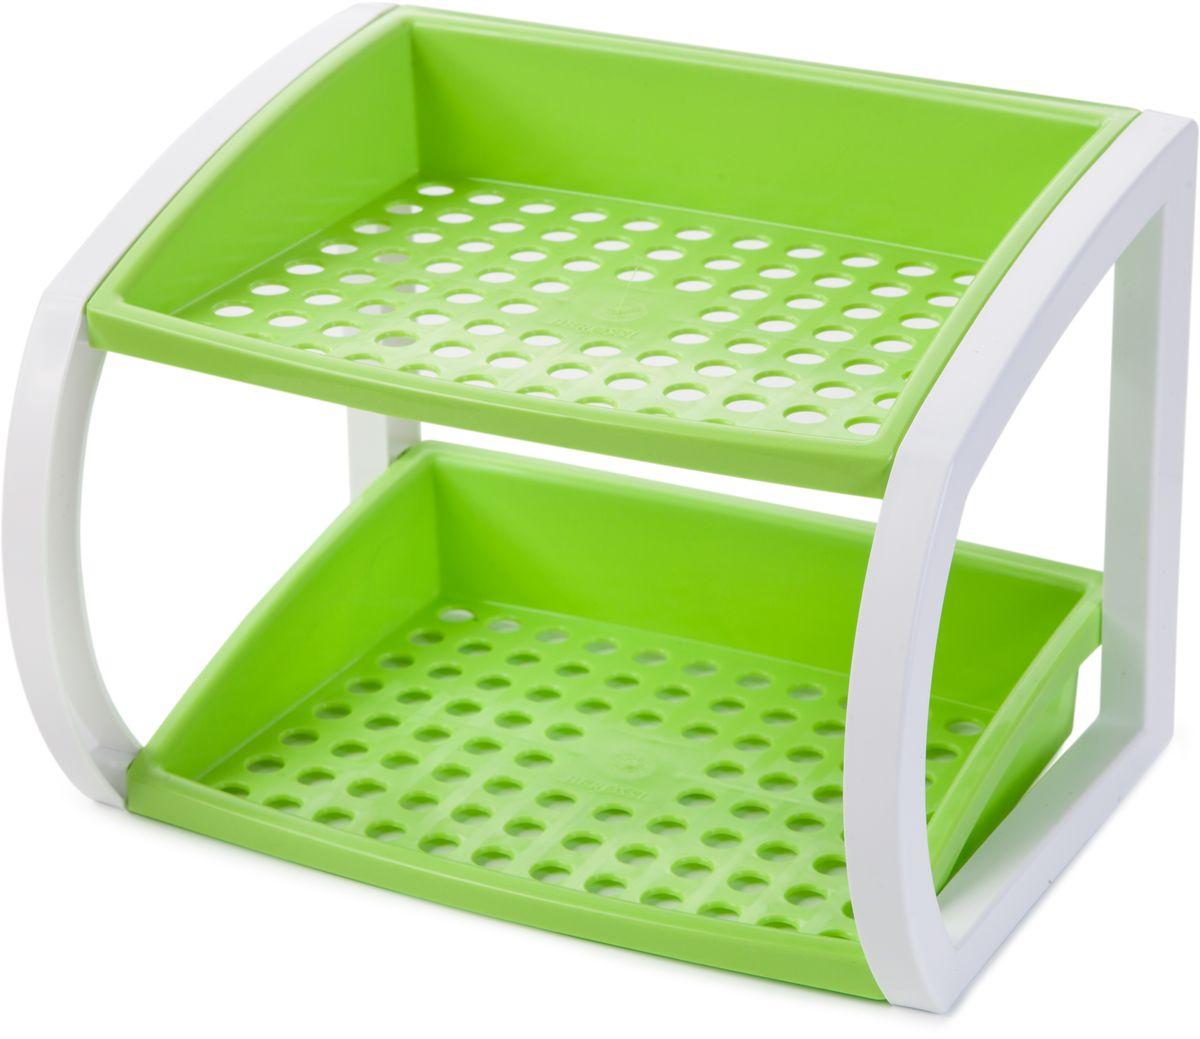 "Подставка кухонная Berossi ""Hokky"", универсальная, цвет: светло-зеленый, 24,7 х 18,3 х 18 см"